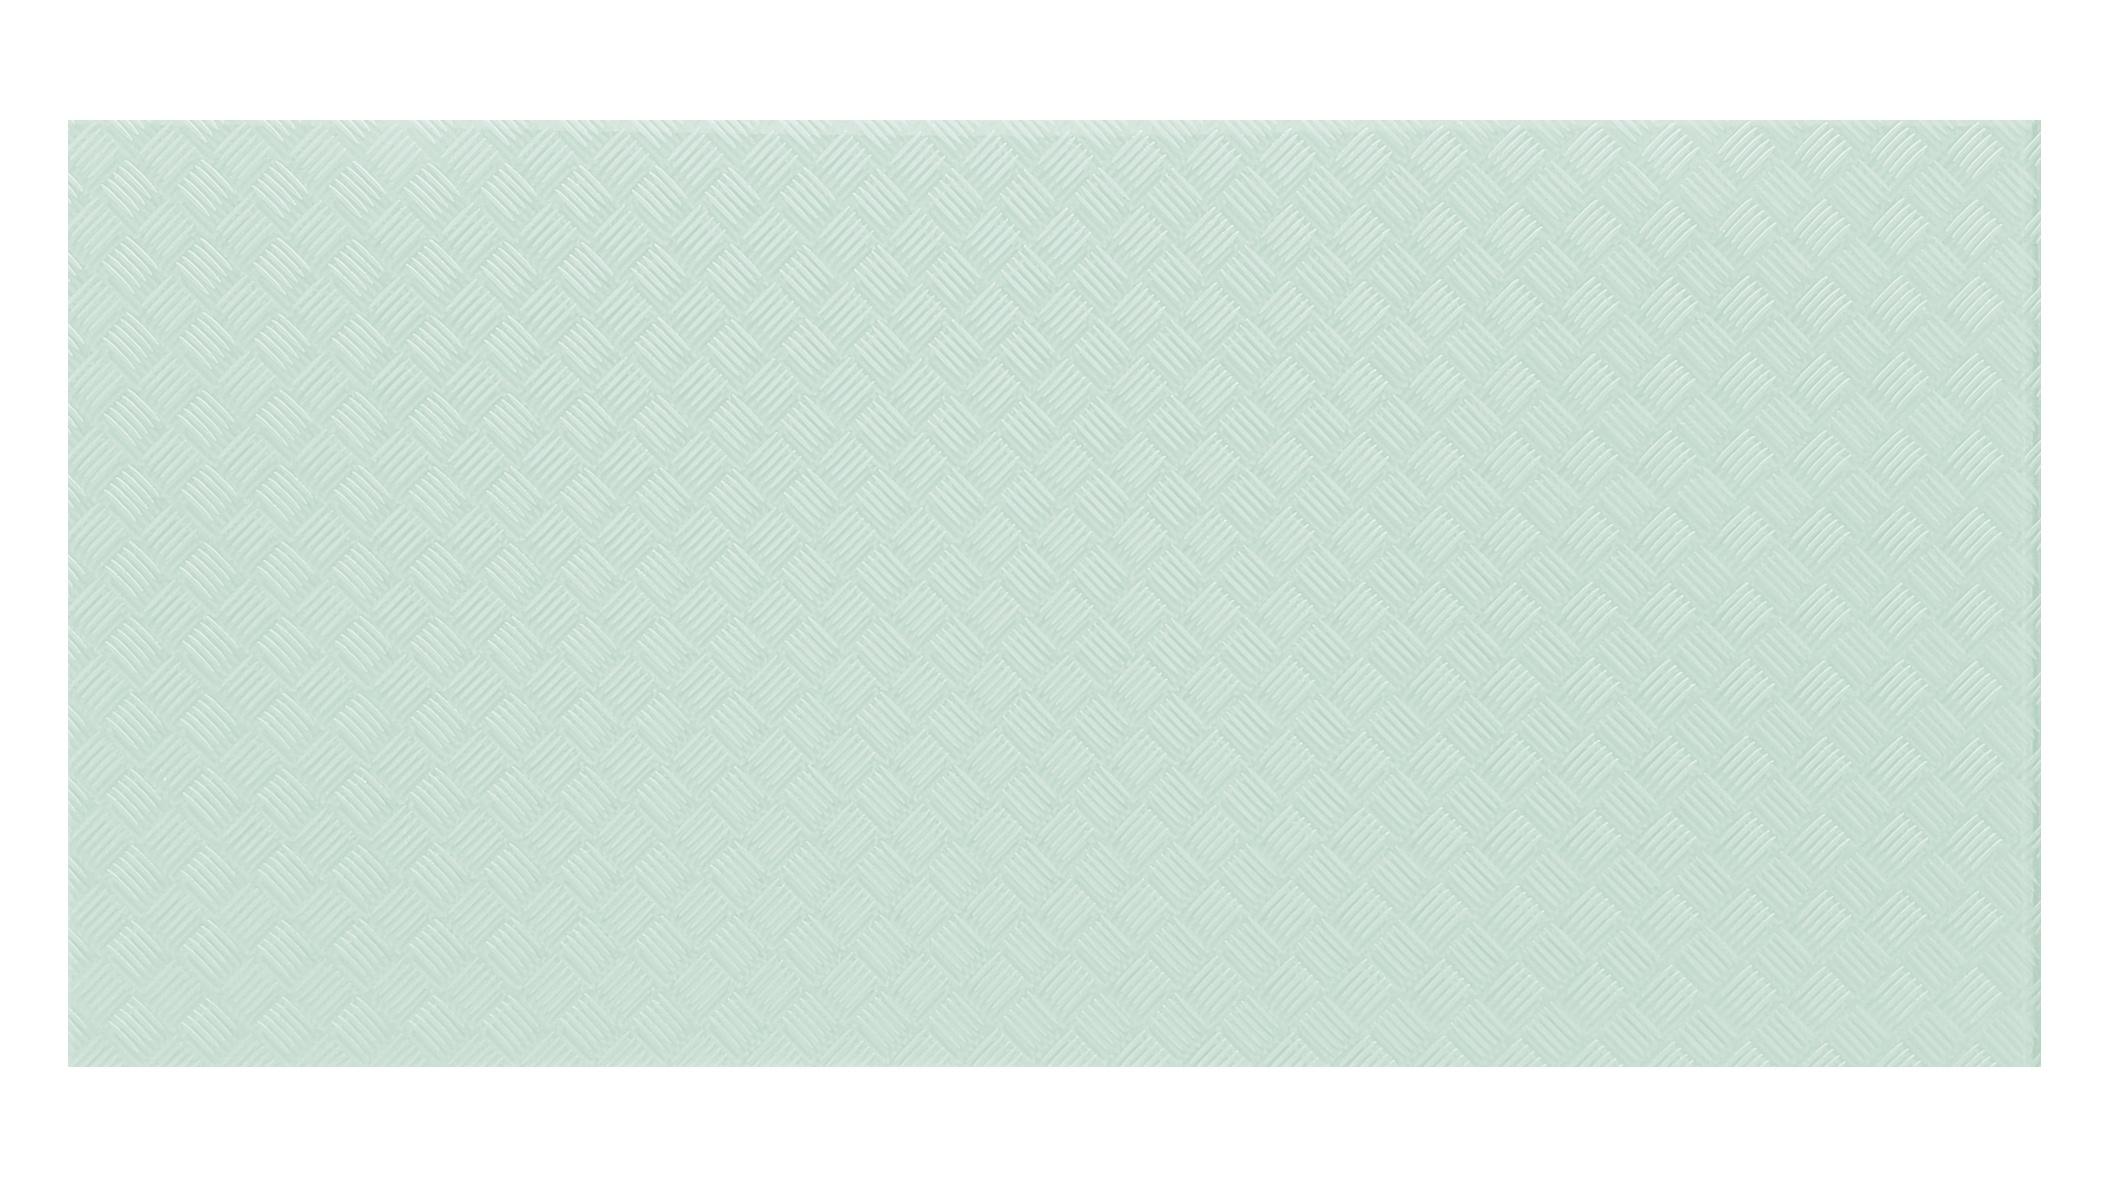 "Elements 12"" x 24"" Slip Resistant Aquamarine Glass Field Backsplash Wall & Floor Tile"